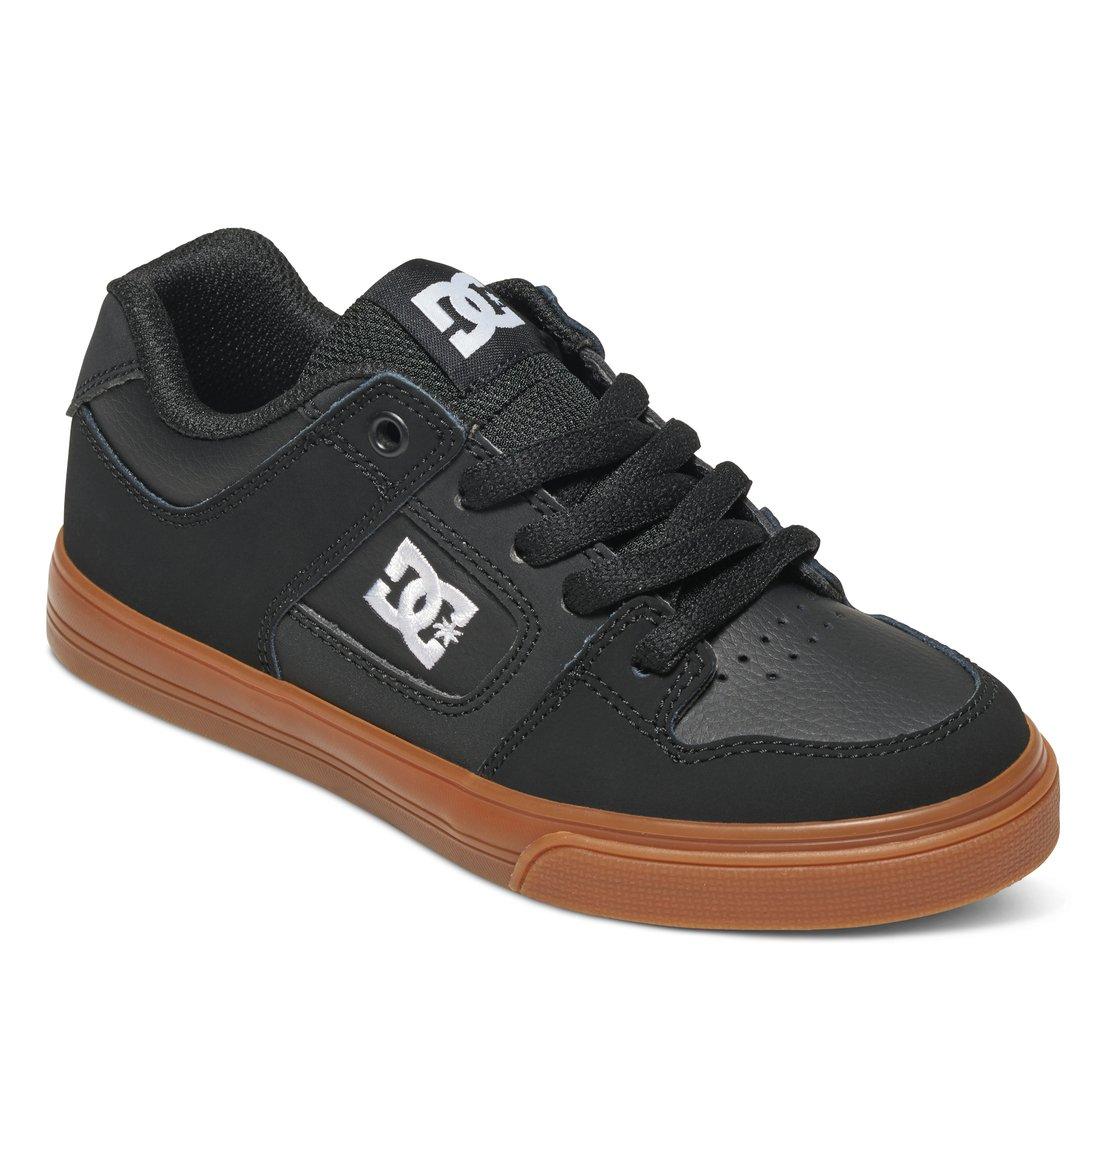 boy 39 s 8 16 pure shoes 301069b dc shoes. Black Bedroom Furniture Sets. Home Design Ideas